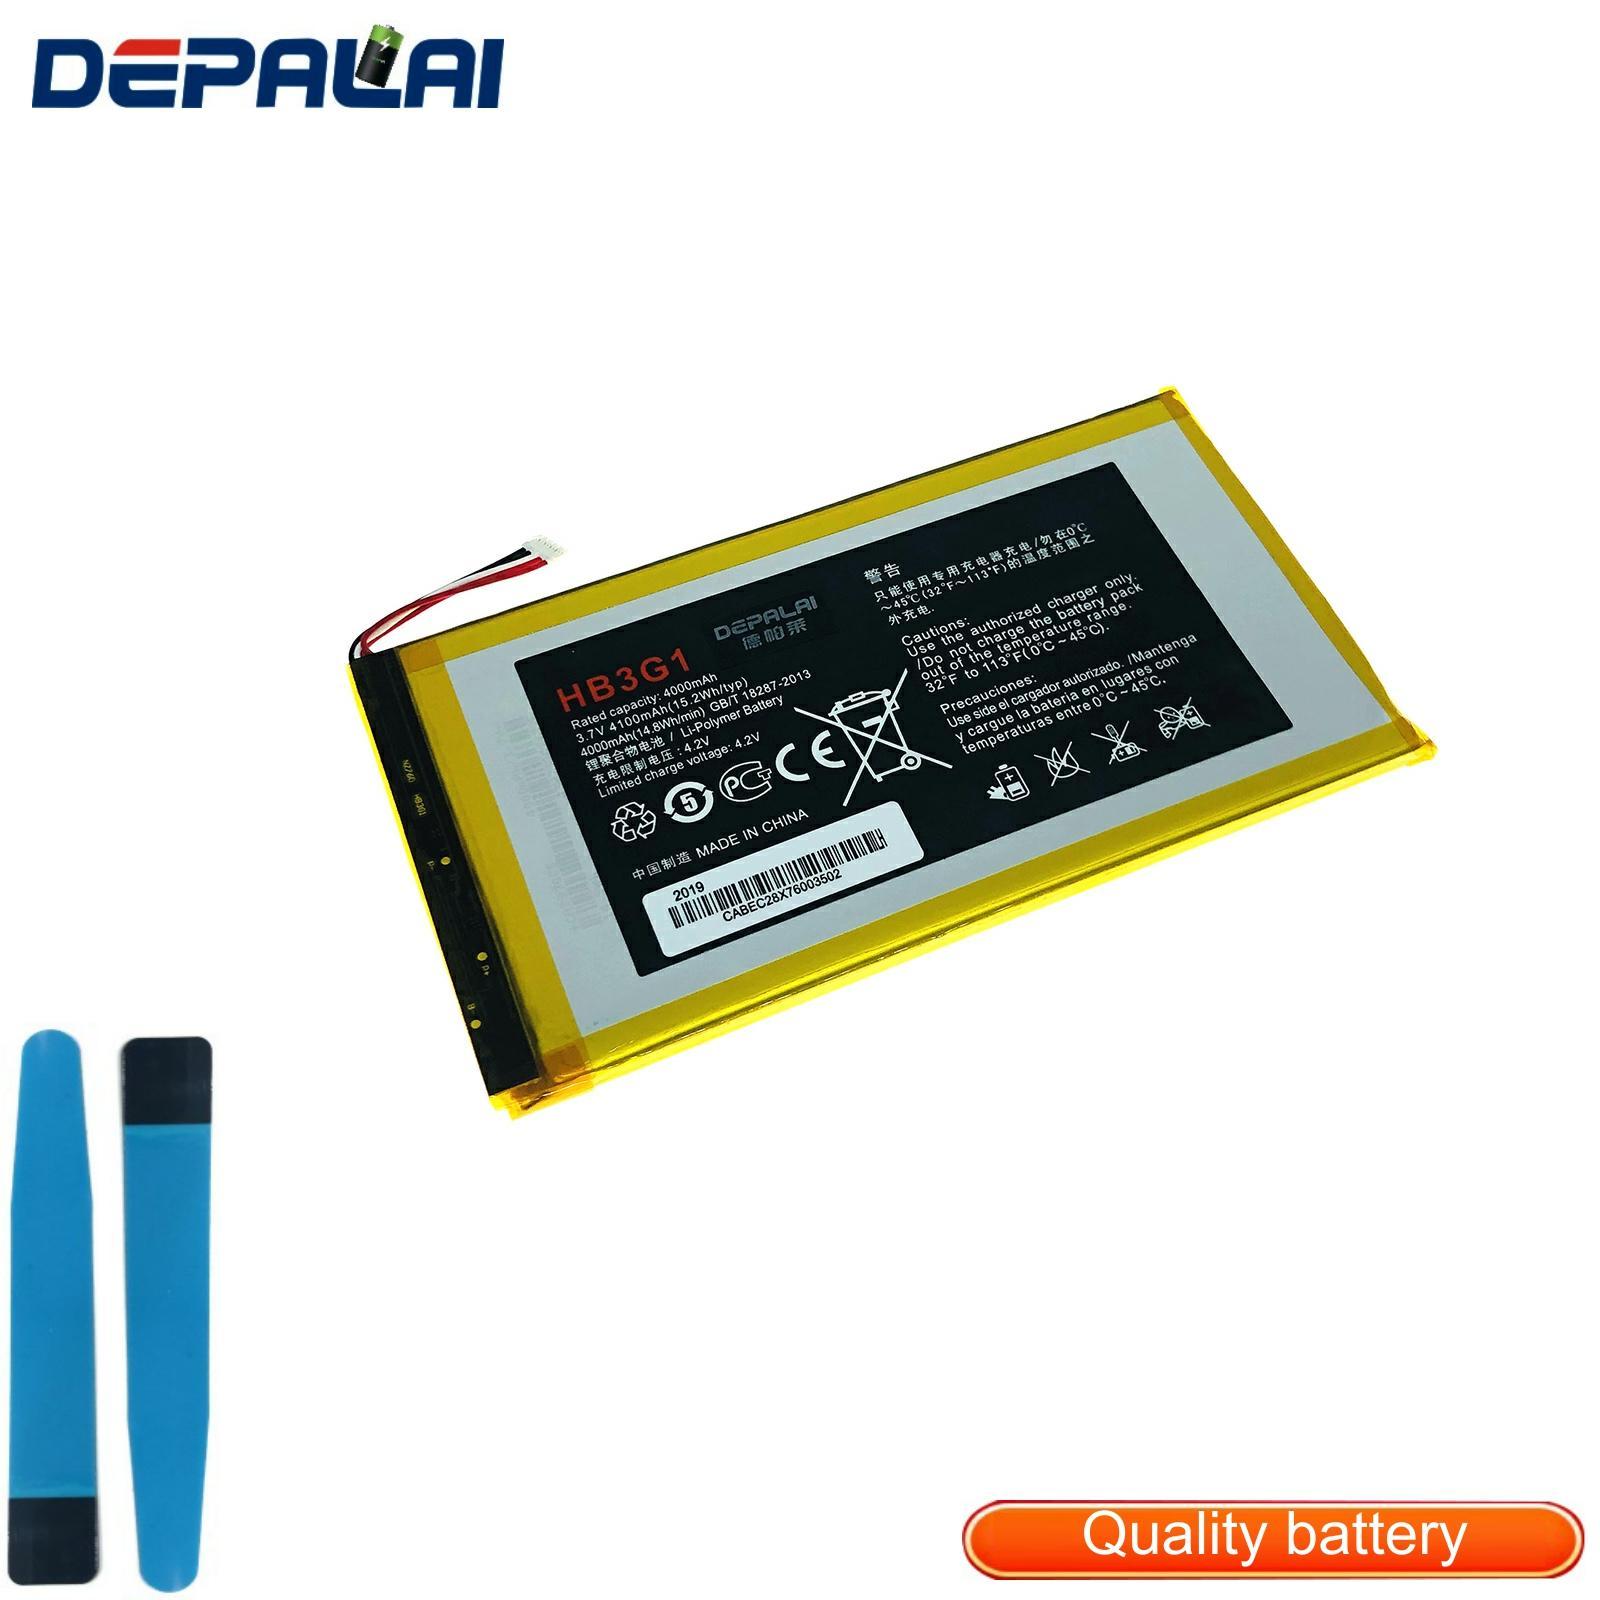 Good Quality 4100mAh HB3G1 Battery For Huawei MediaPad 7 Lite S7-301u 301w 302 303 Tablet PC HB3G1H Bateria Batterij Accumulato